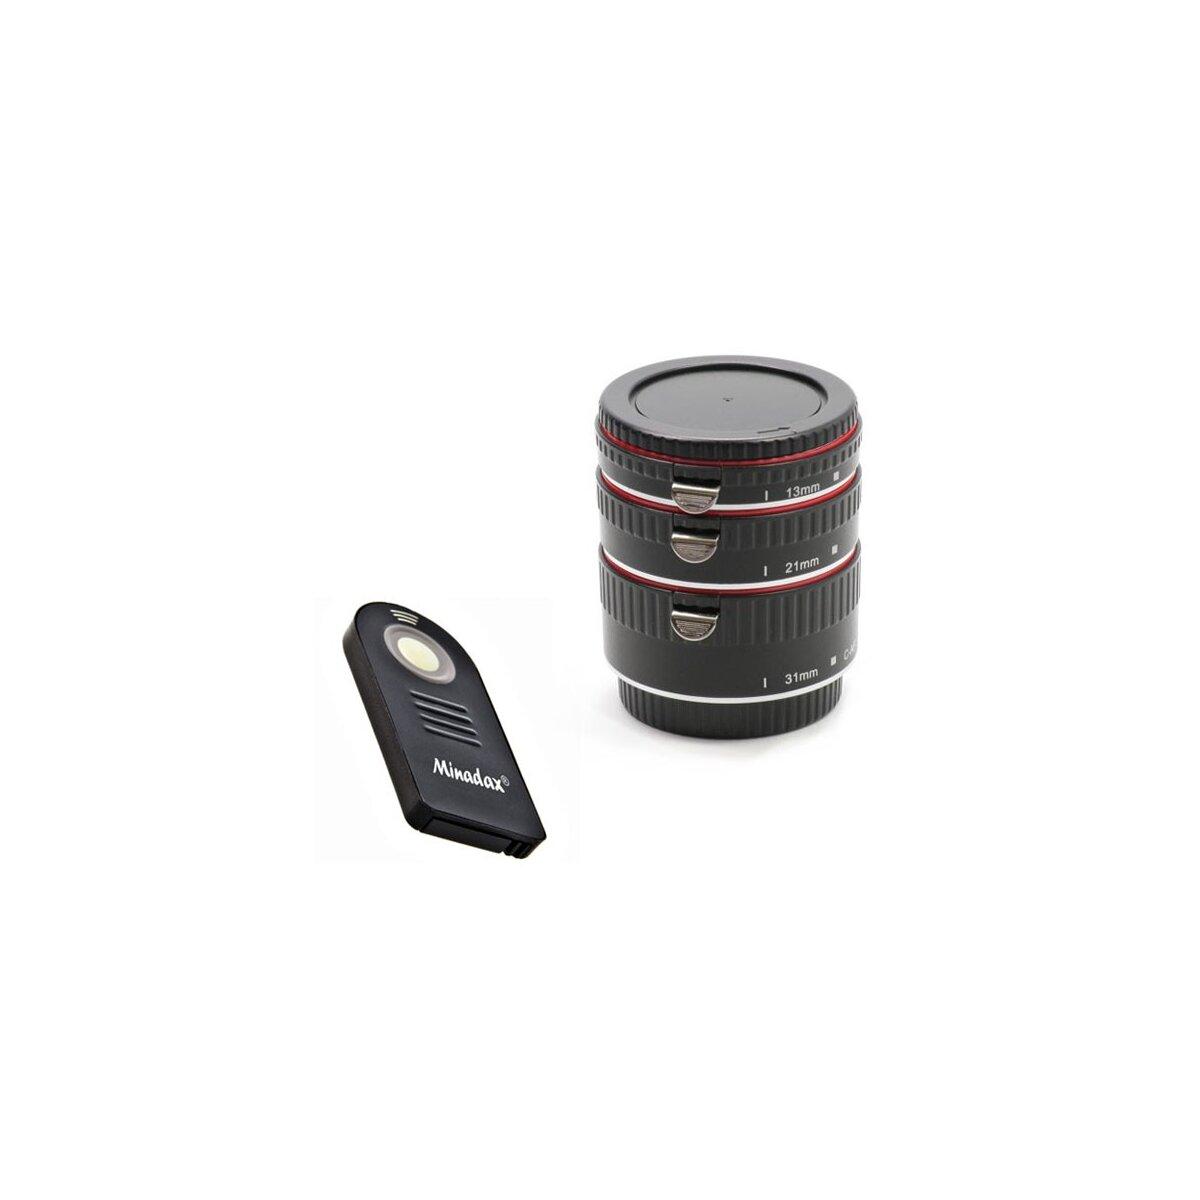 Minadax Automatik Zwischenringe 3-teilig 31mm, 21mm, 13mm Makrofotographie + Infrarot Fernausloeser & passende Neopren Tasche fuer Canon EF/EF-S EOS 700D, 650D, 600D, 550D, 500D, 450D, 400D, 350D, 300D, 100D, 70D, 60D, 50D, 7D, 6D, 5D Serie